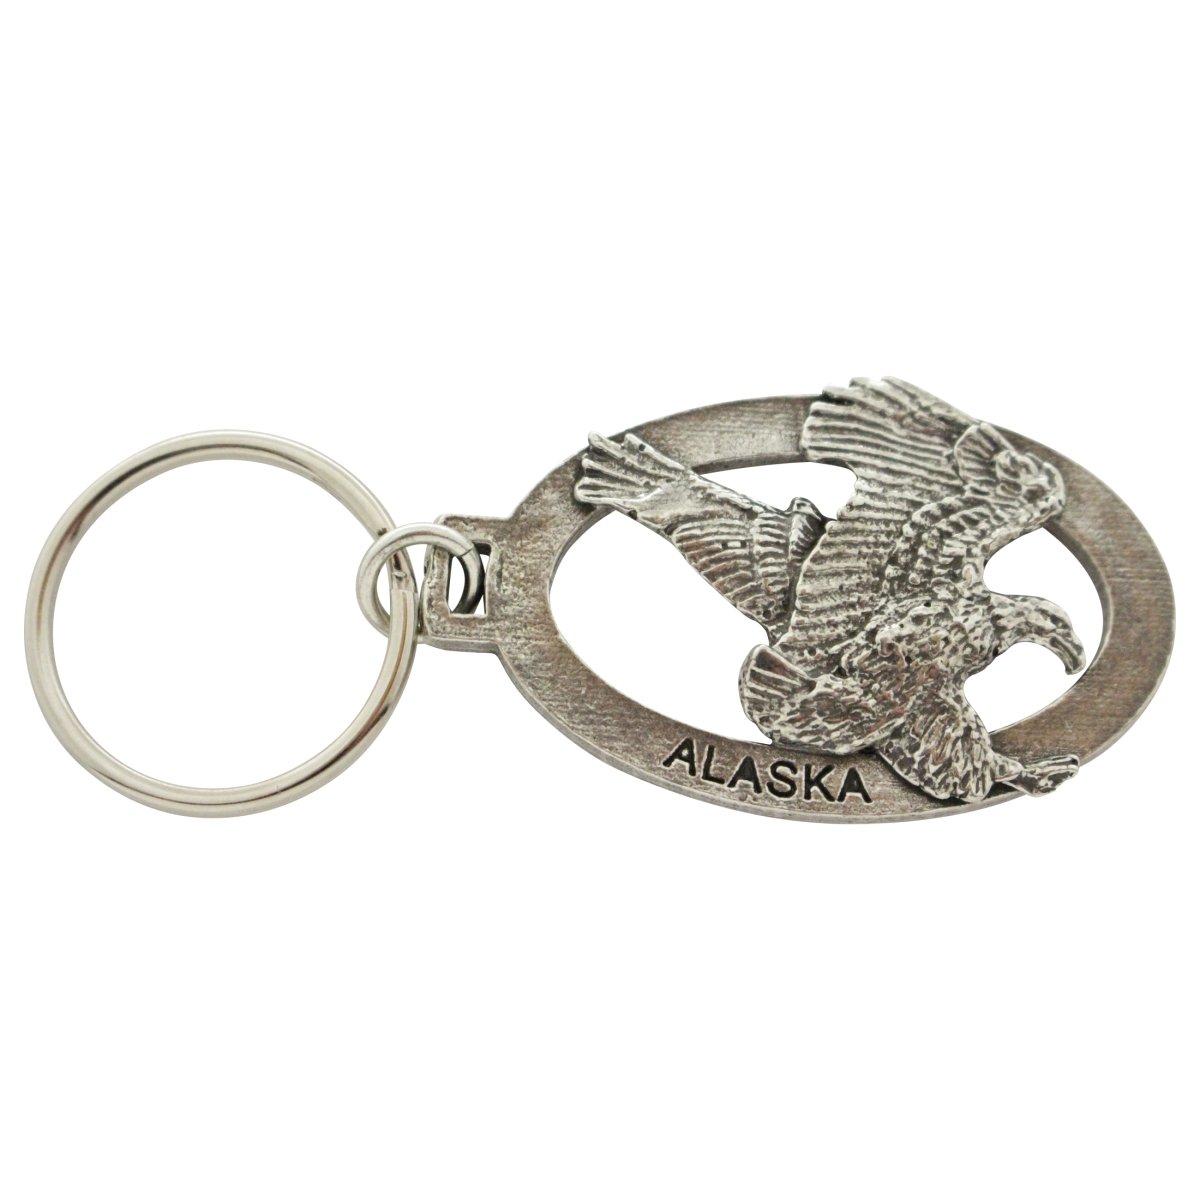 Creative Pewter Designs, Pewter Alaska Eagle Key Chain, Antiqued Finish, A618KC